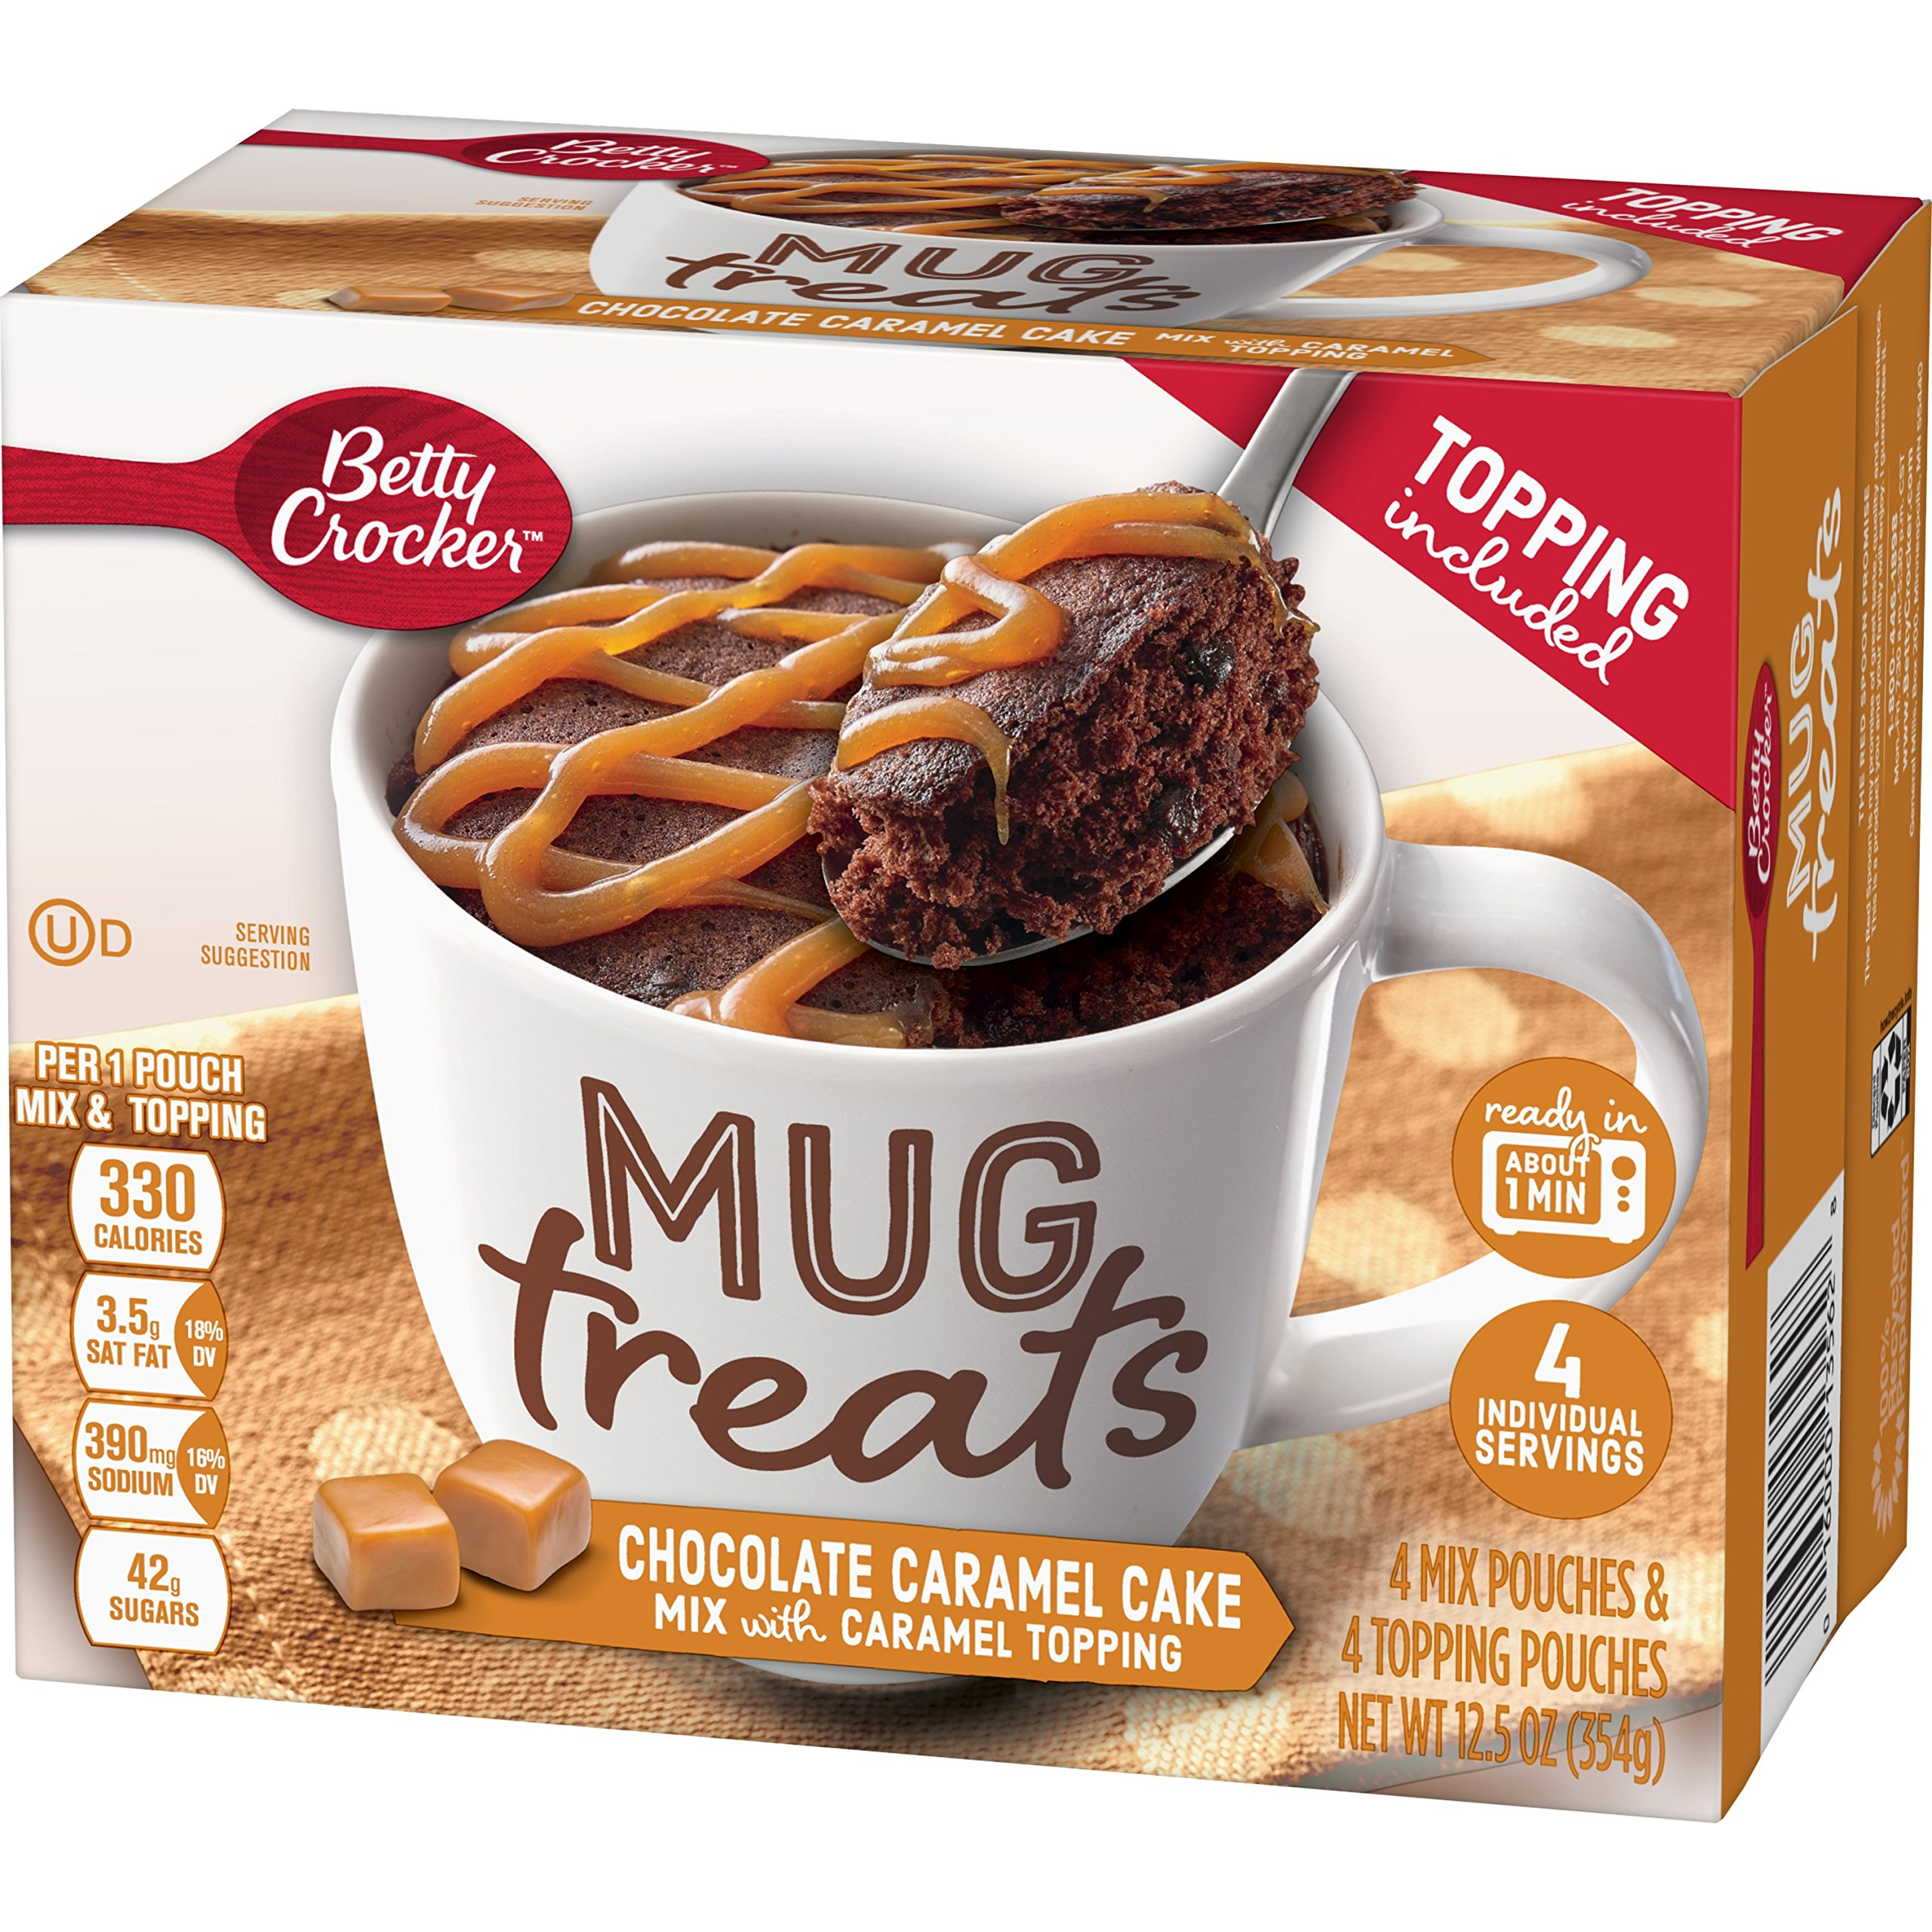 Betty Crocker Baking Mug Treats Chocolate Caramel Cake Mix with Caramel Topping, 12.5 oz(us)